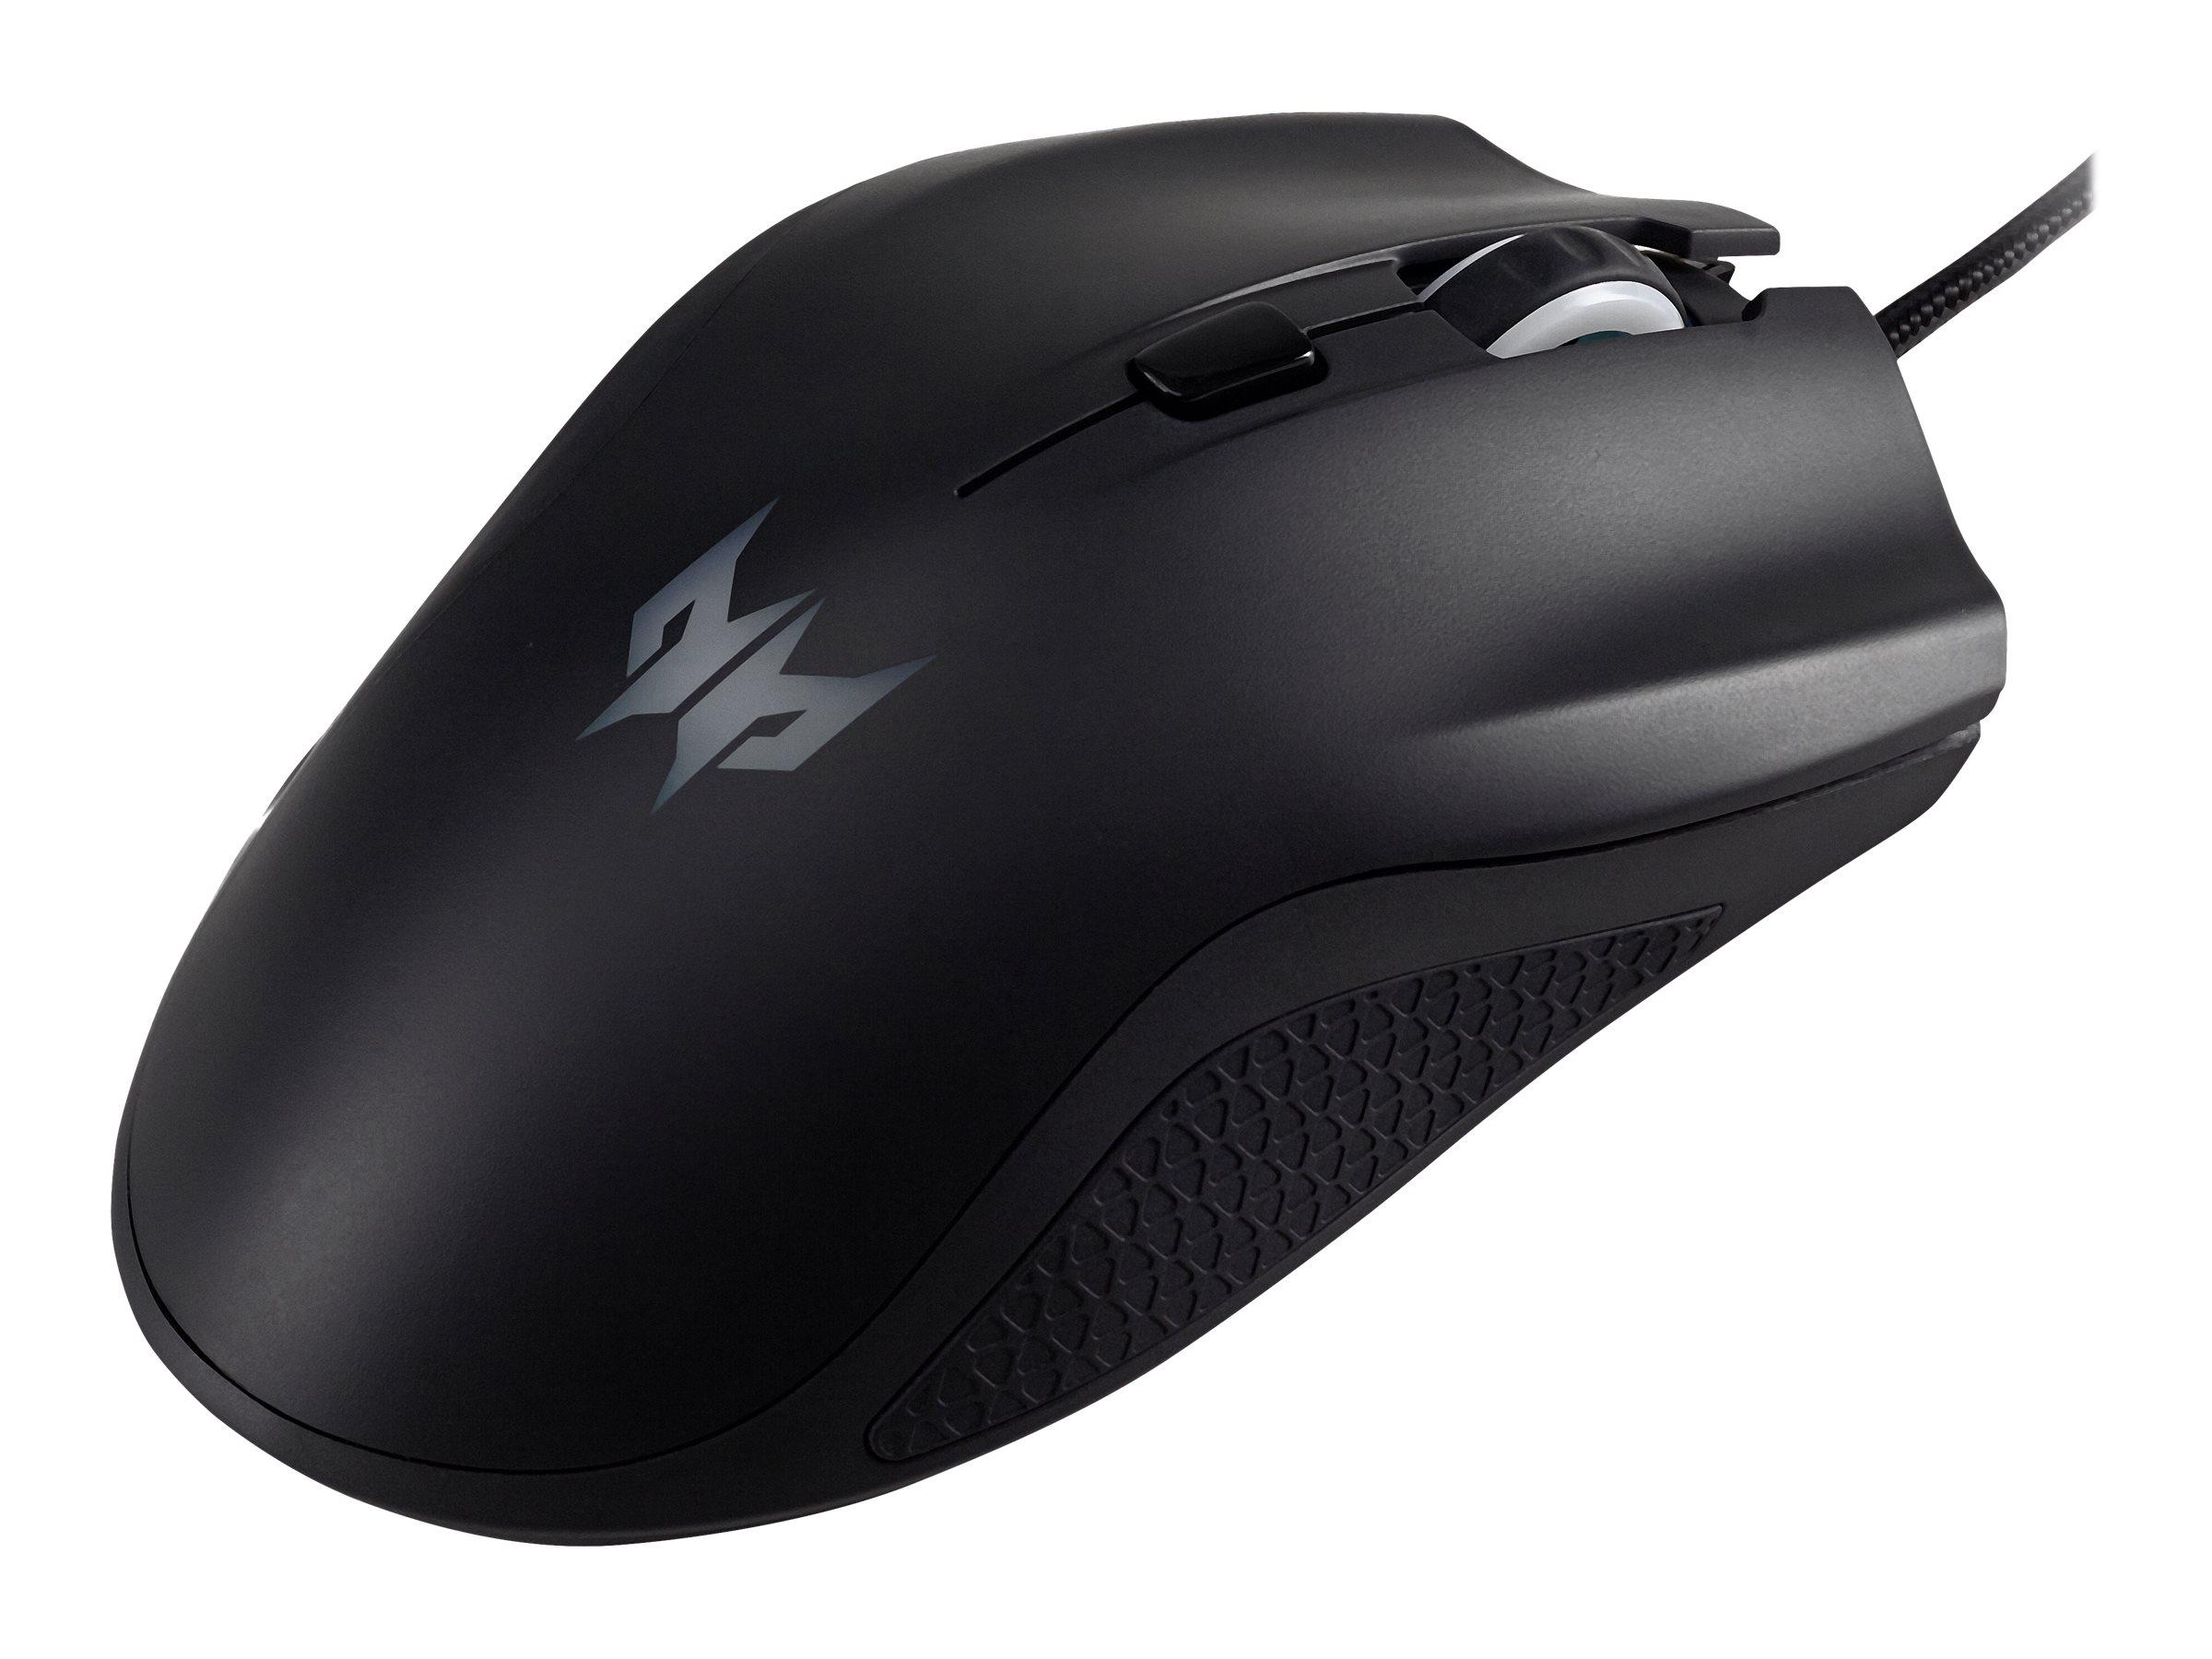 Acer Predator Cestus 320 (PMW800) - mouse - USB - black